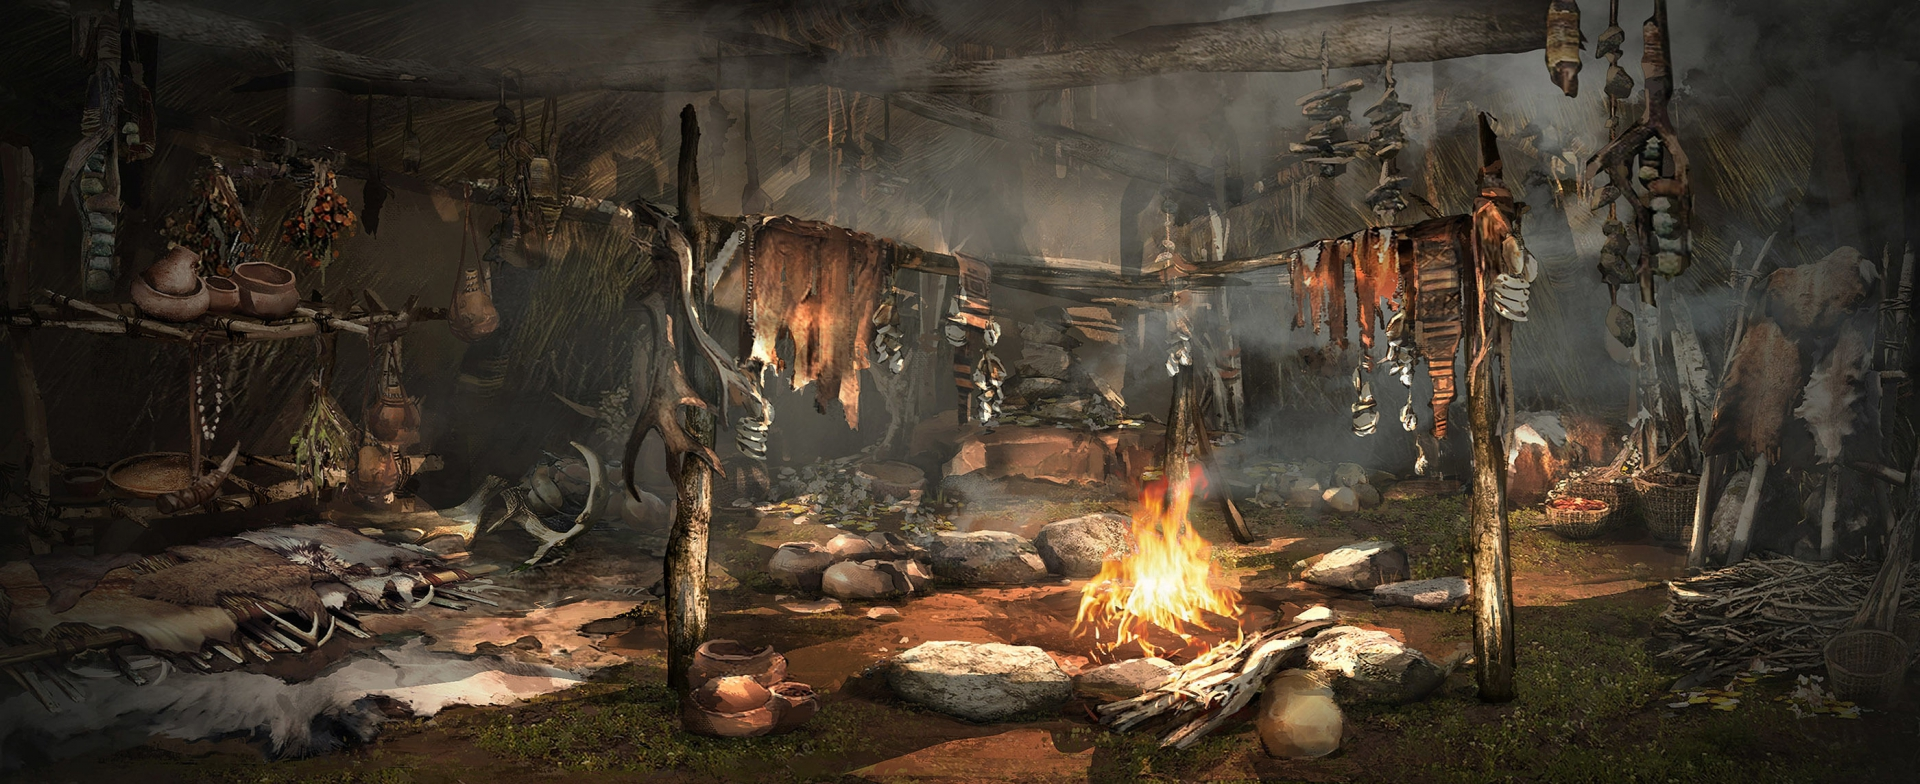 Арт к игре Far Cry: Primal